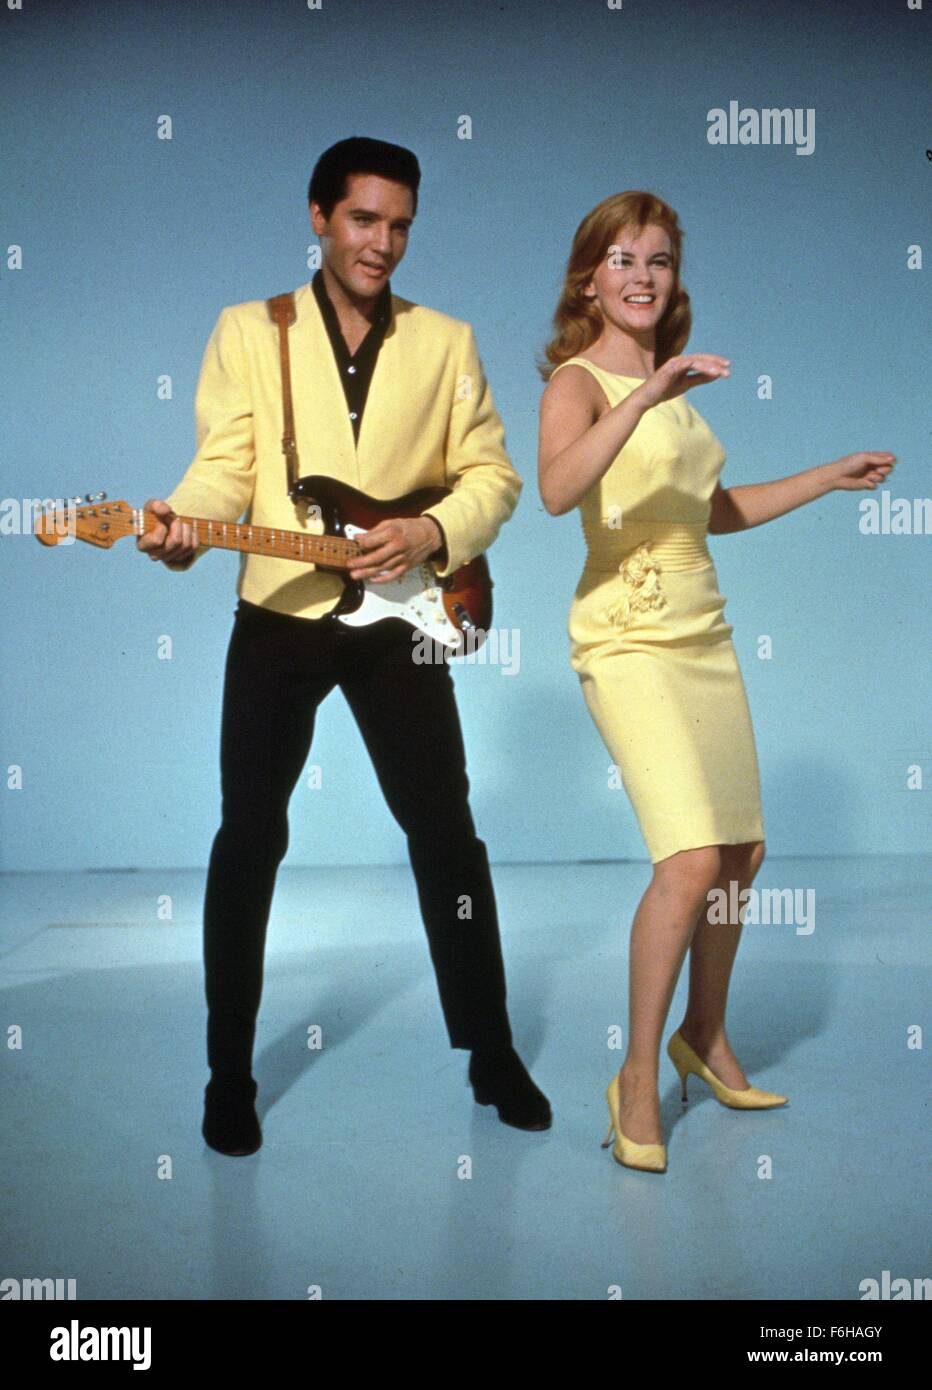 1965, Film Title: VIVA LAS VEGAS, Director: GEORGE SIDNEY, Studio: MGM, Pictured: ANN-MARGRET, DANCING, GUITAR, - Stock Image